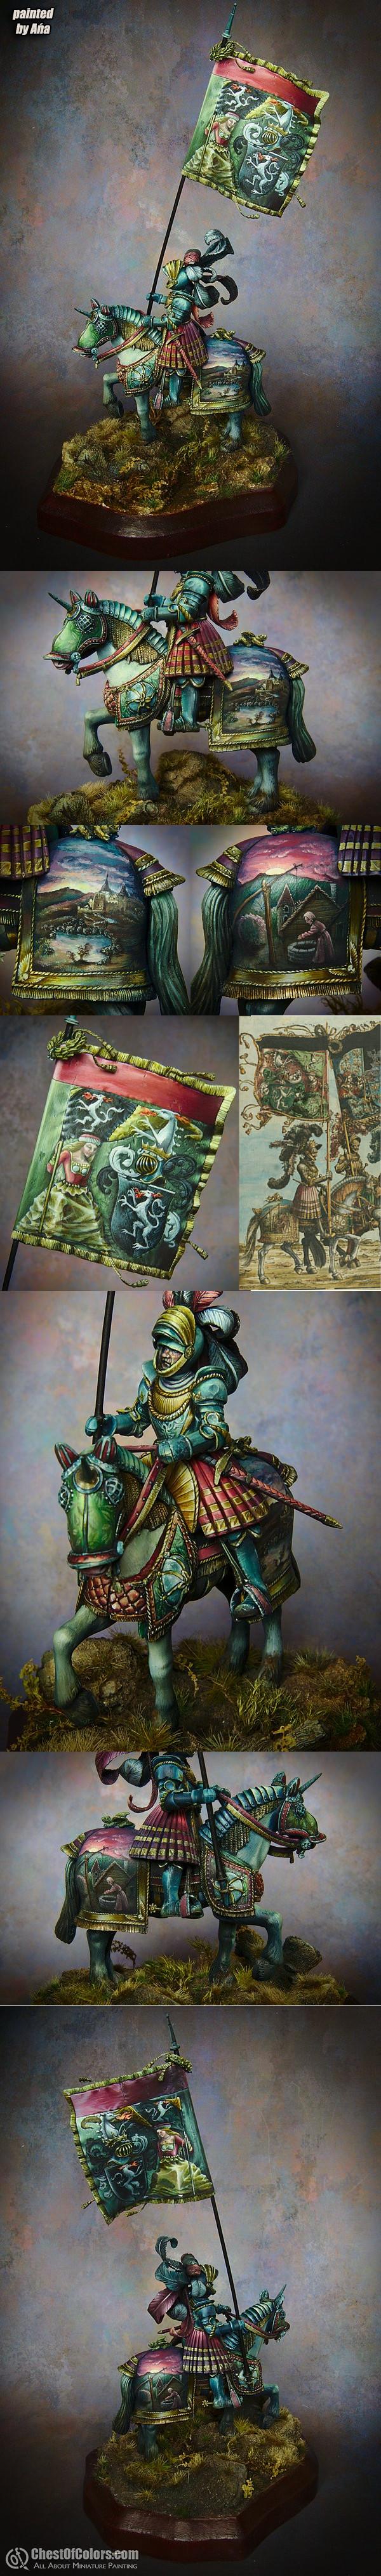 Emperor Maximilian's Renaissance Knight